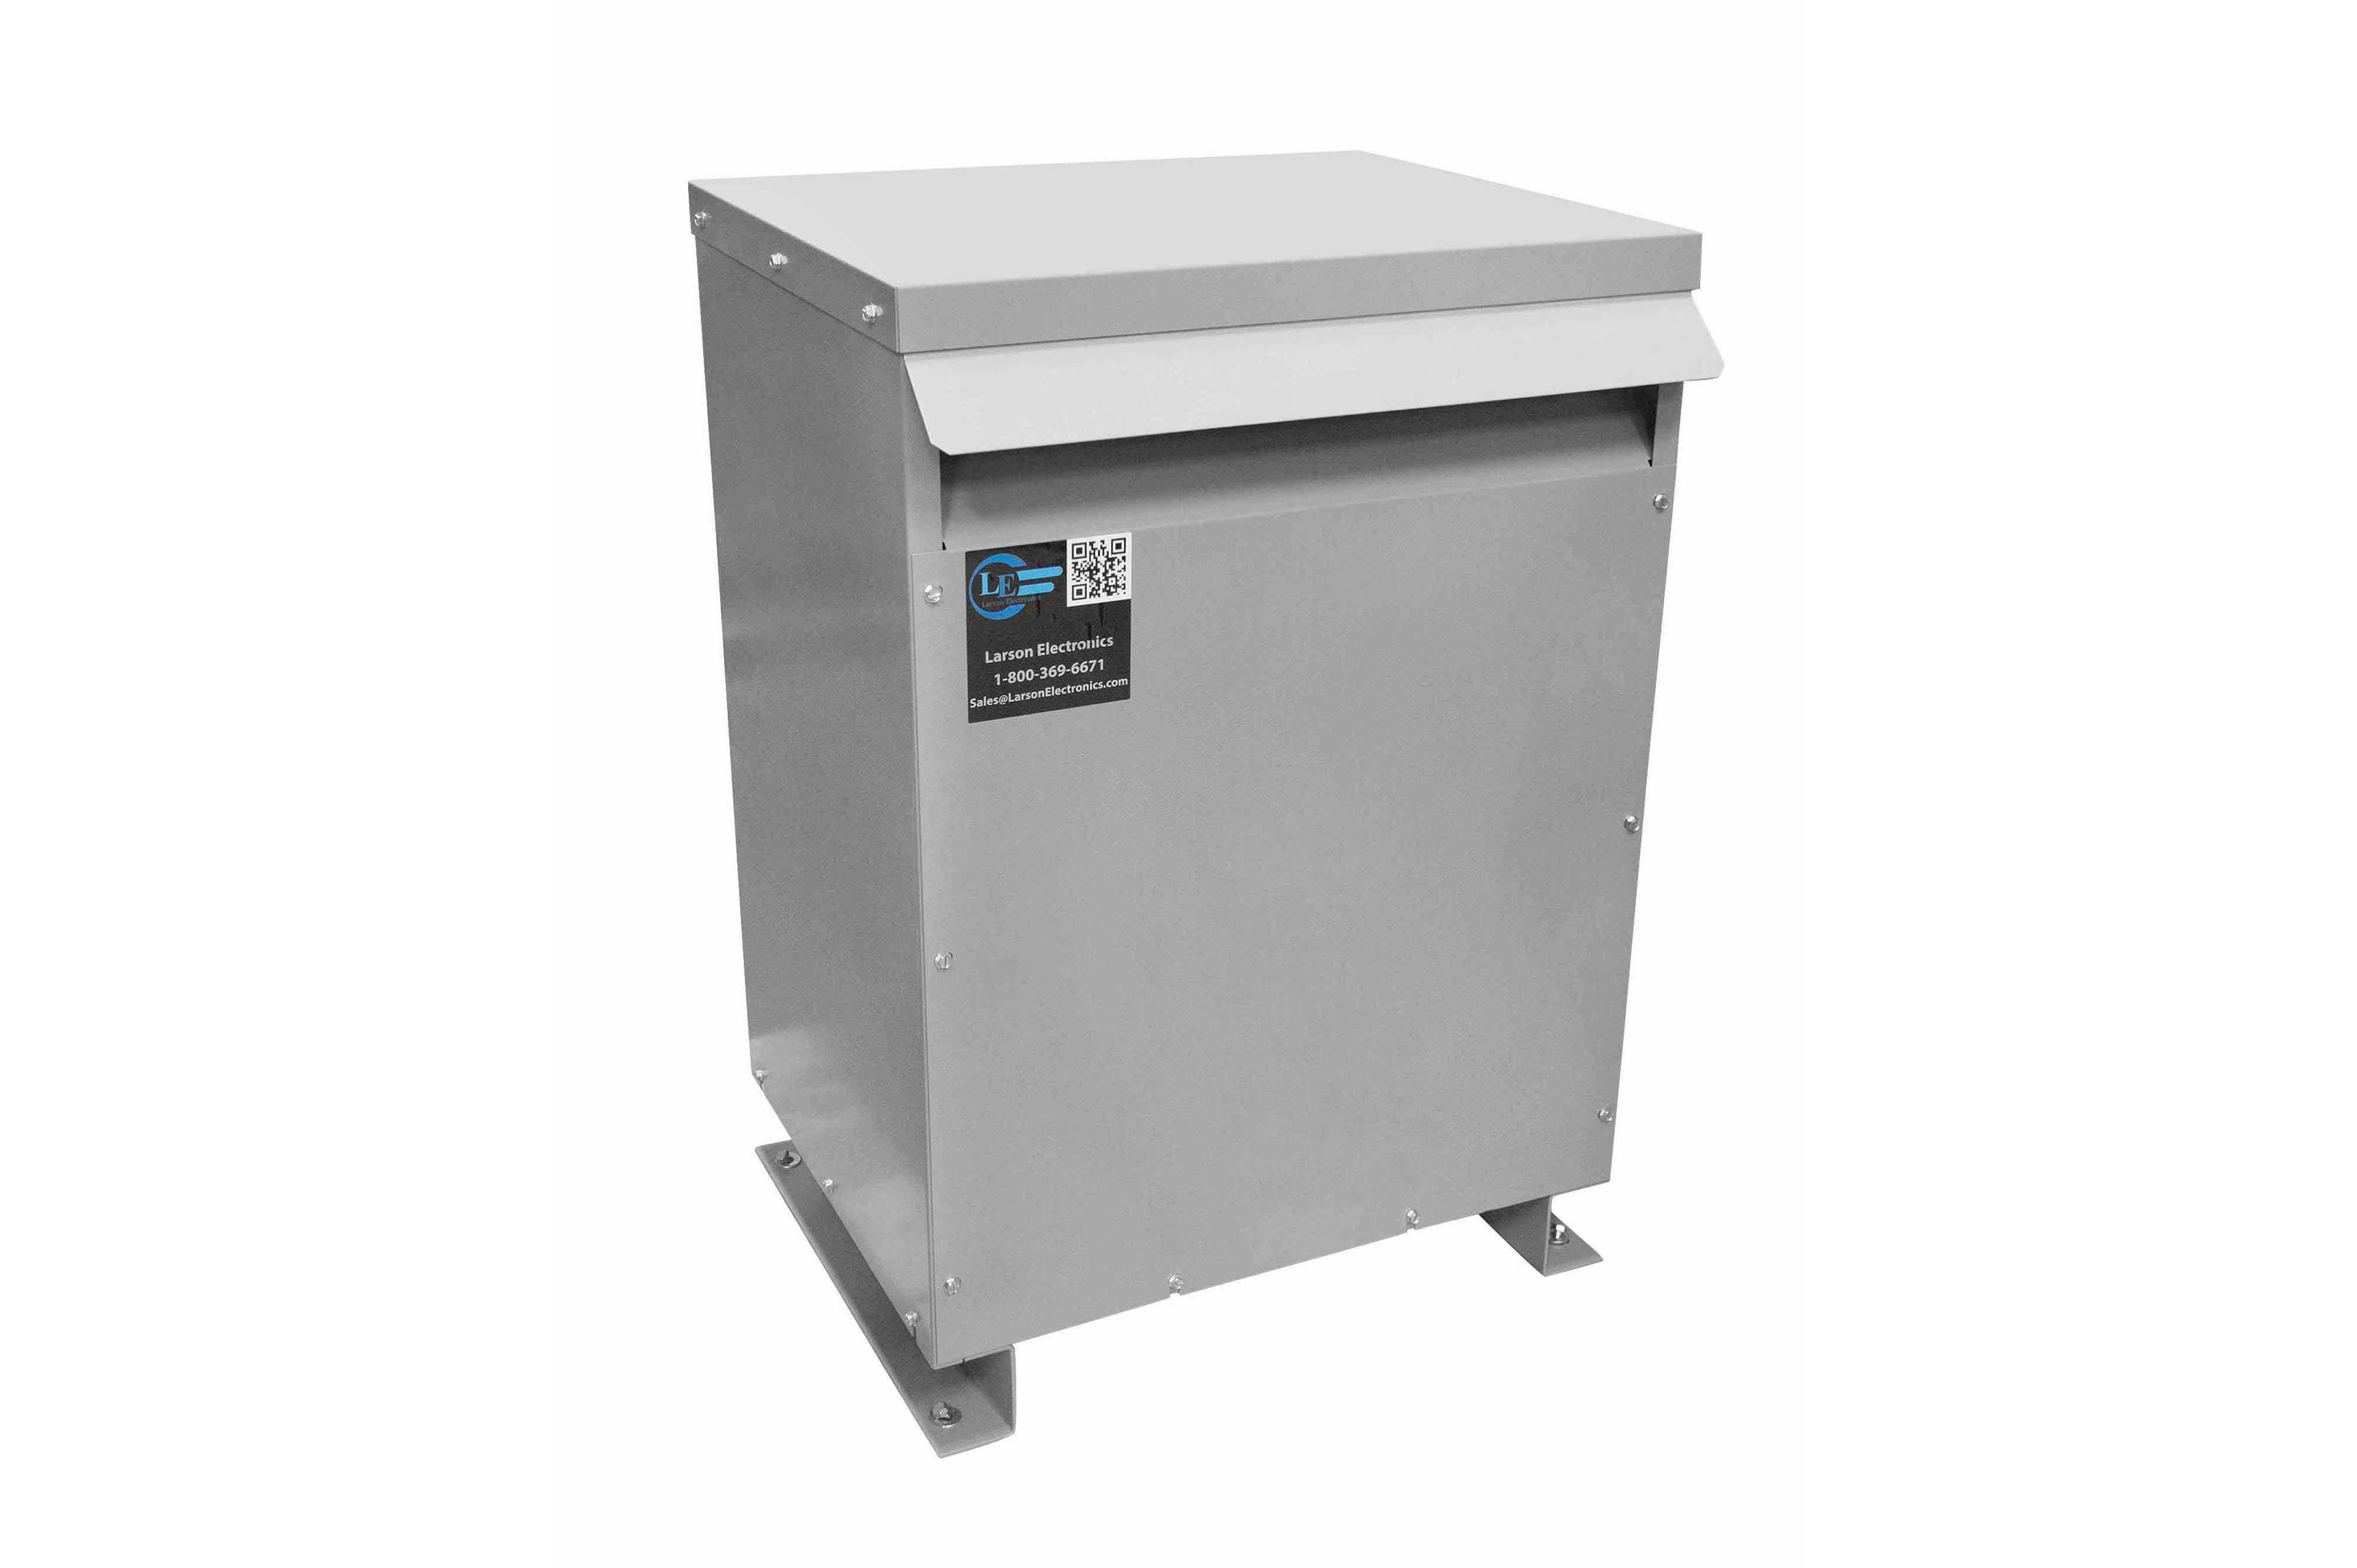 27 kVA 3PH Isolation Transformer, 480V Wye Primary, 380V Delta Secondary, N3R, Ventilated, 60 Hz